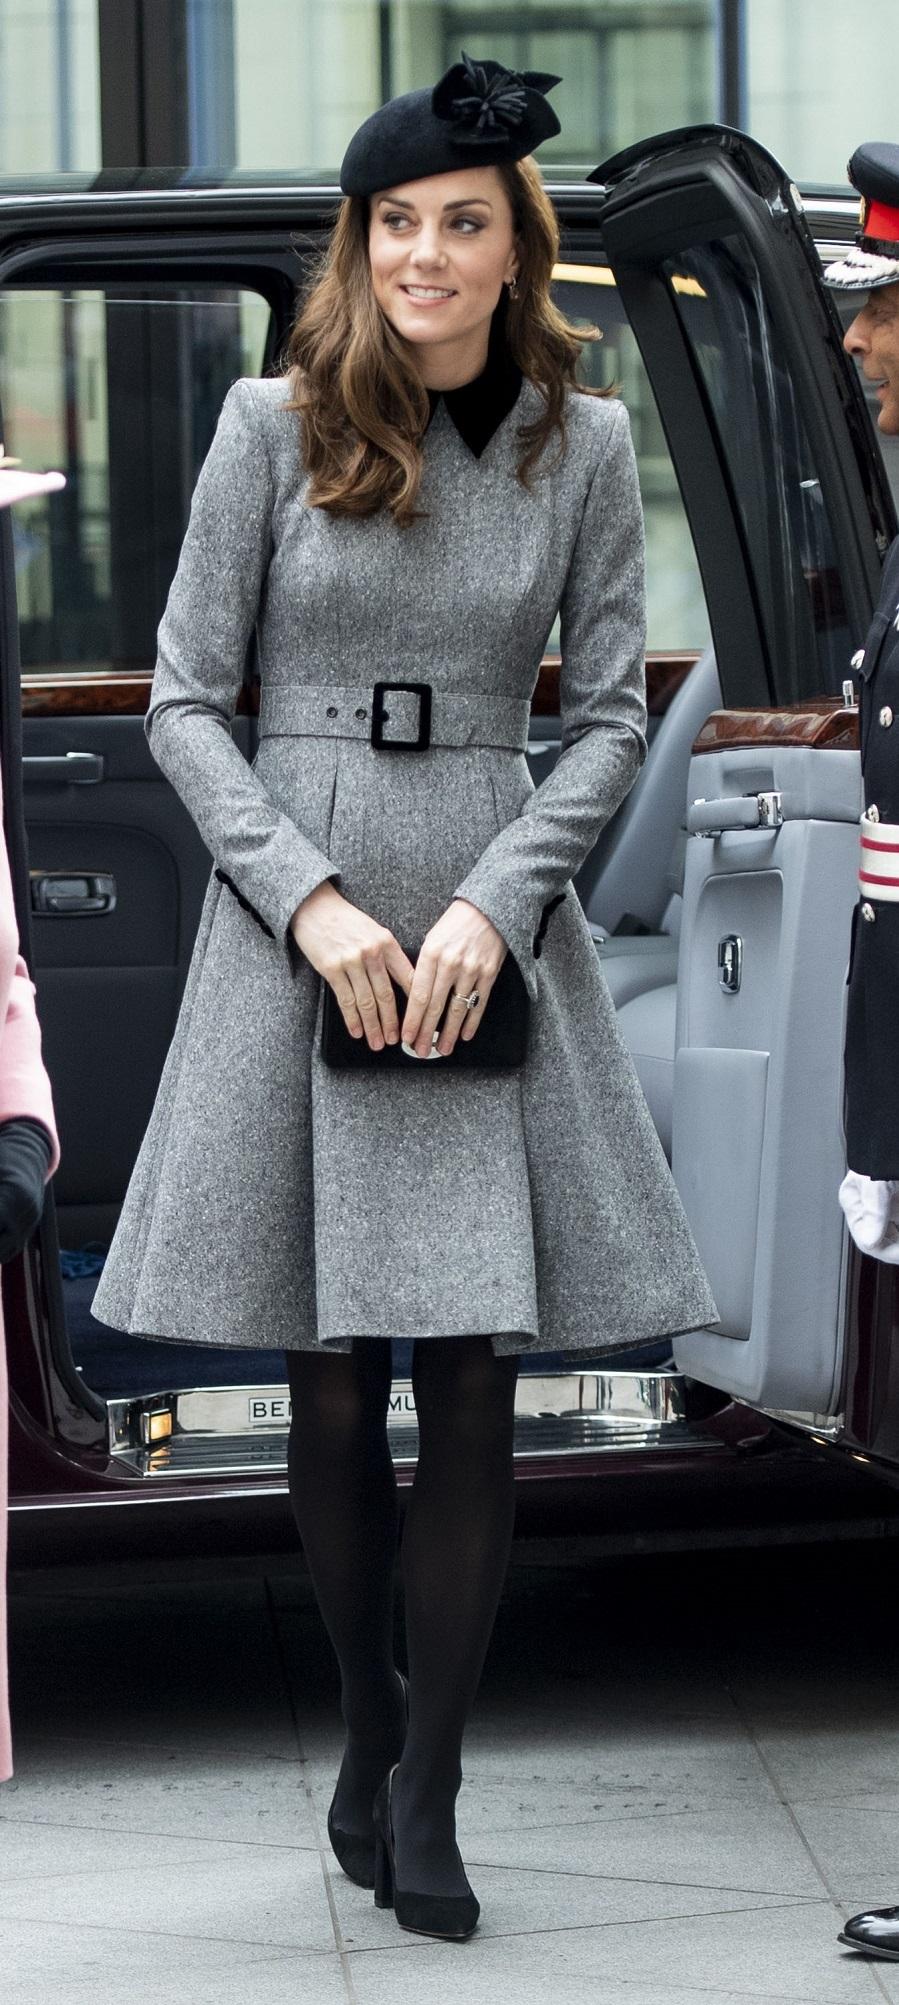 El estilo de Kate Middleton  - Abrigo vestido de Catherine Walker